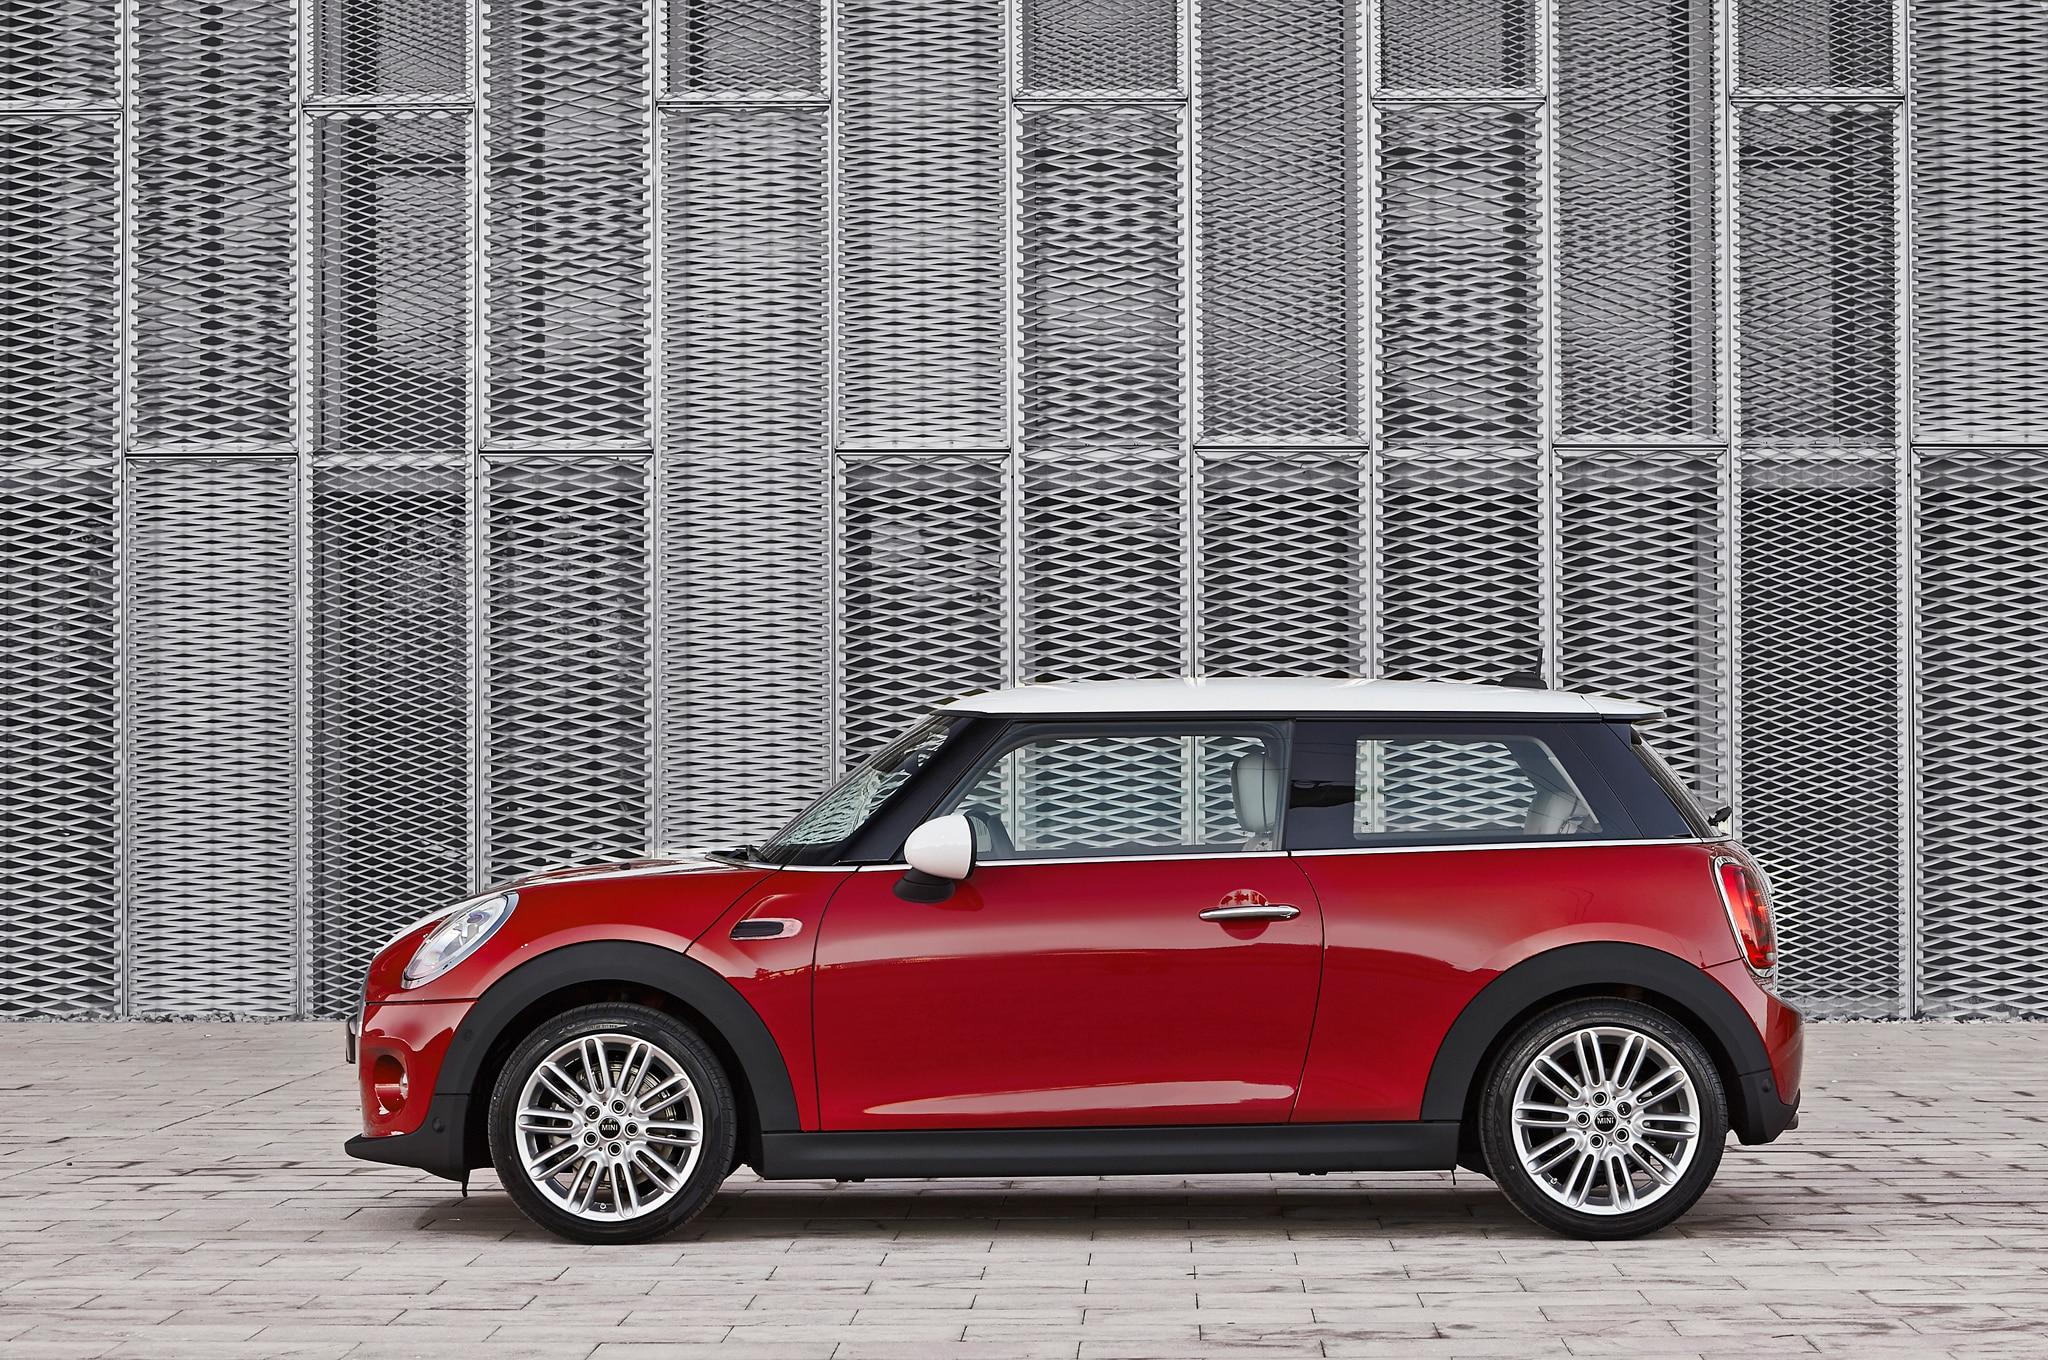 2014 Mini Cooper Hardtop Priced at 20745 Cooper S at 24395